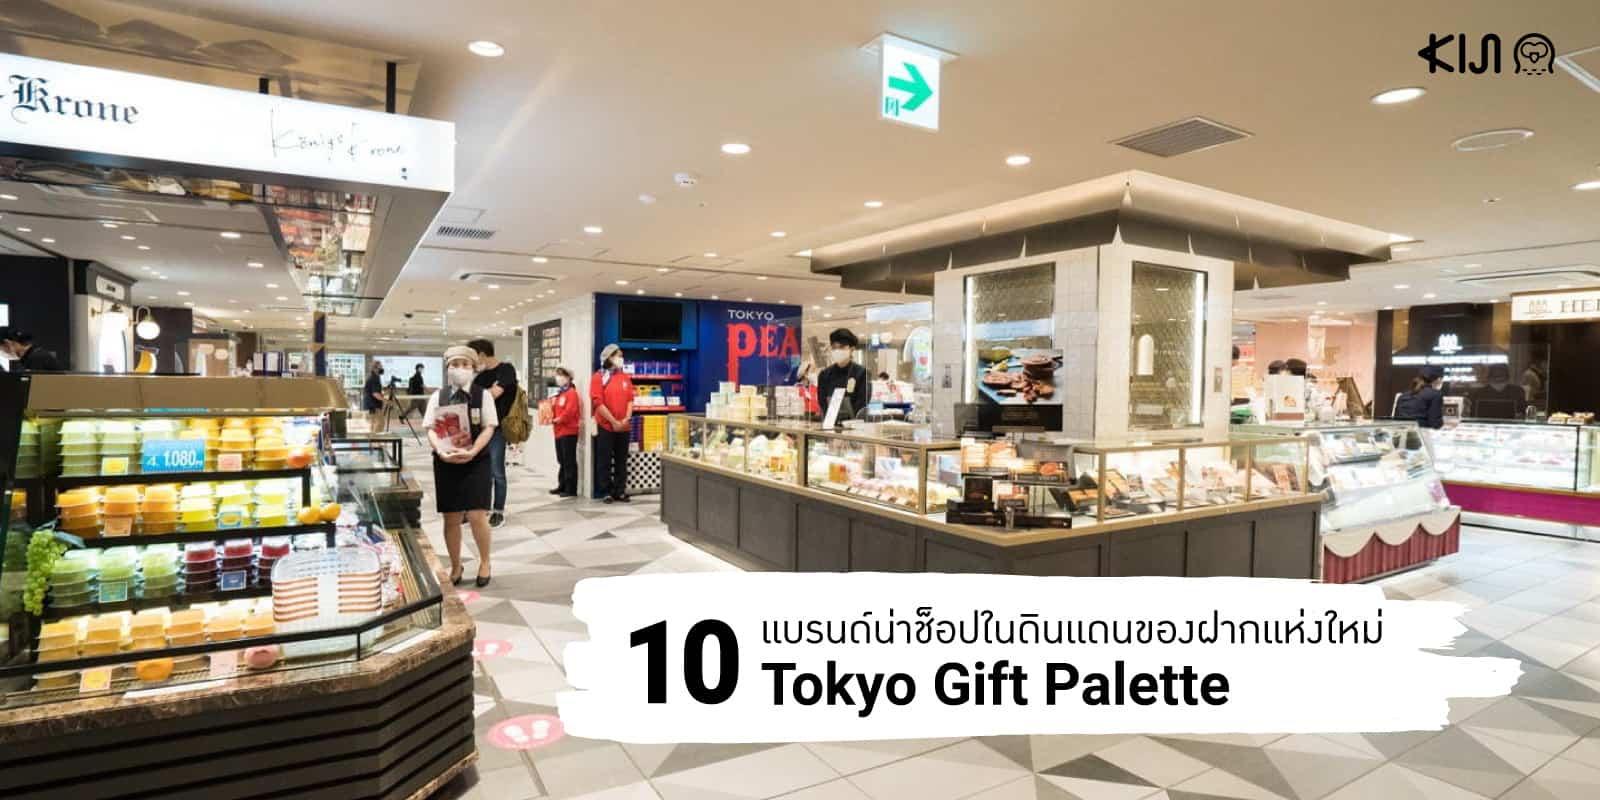 Tokyo Gift Palette แหล่งซื้อของฝากในโตเกียว ของฝากโตเกียว